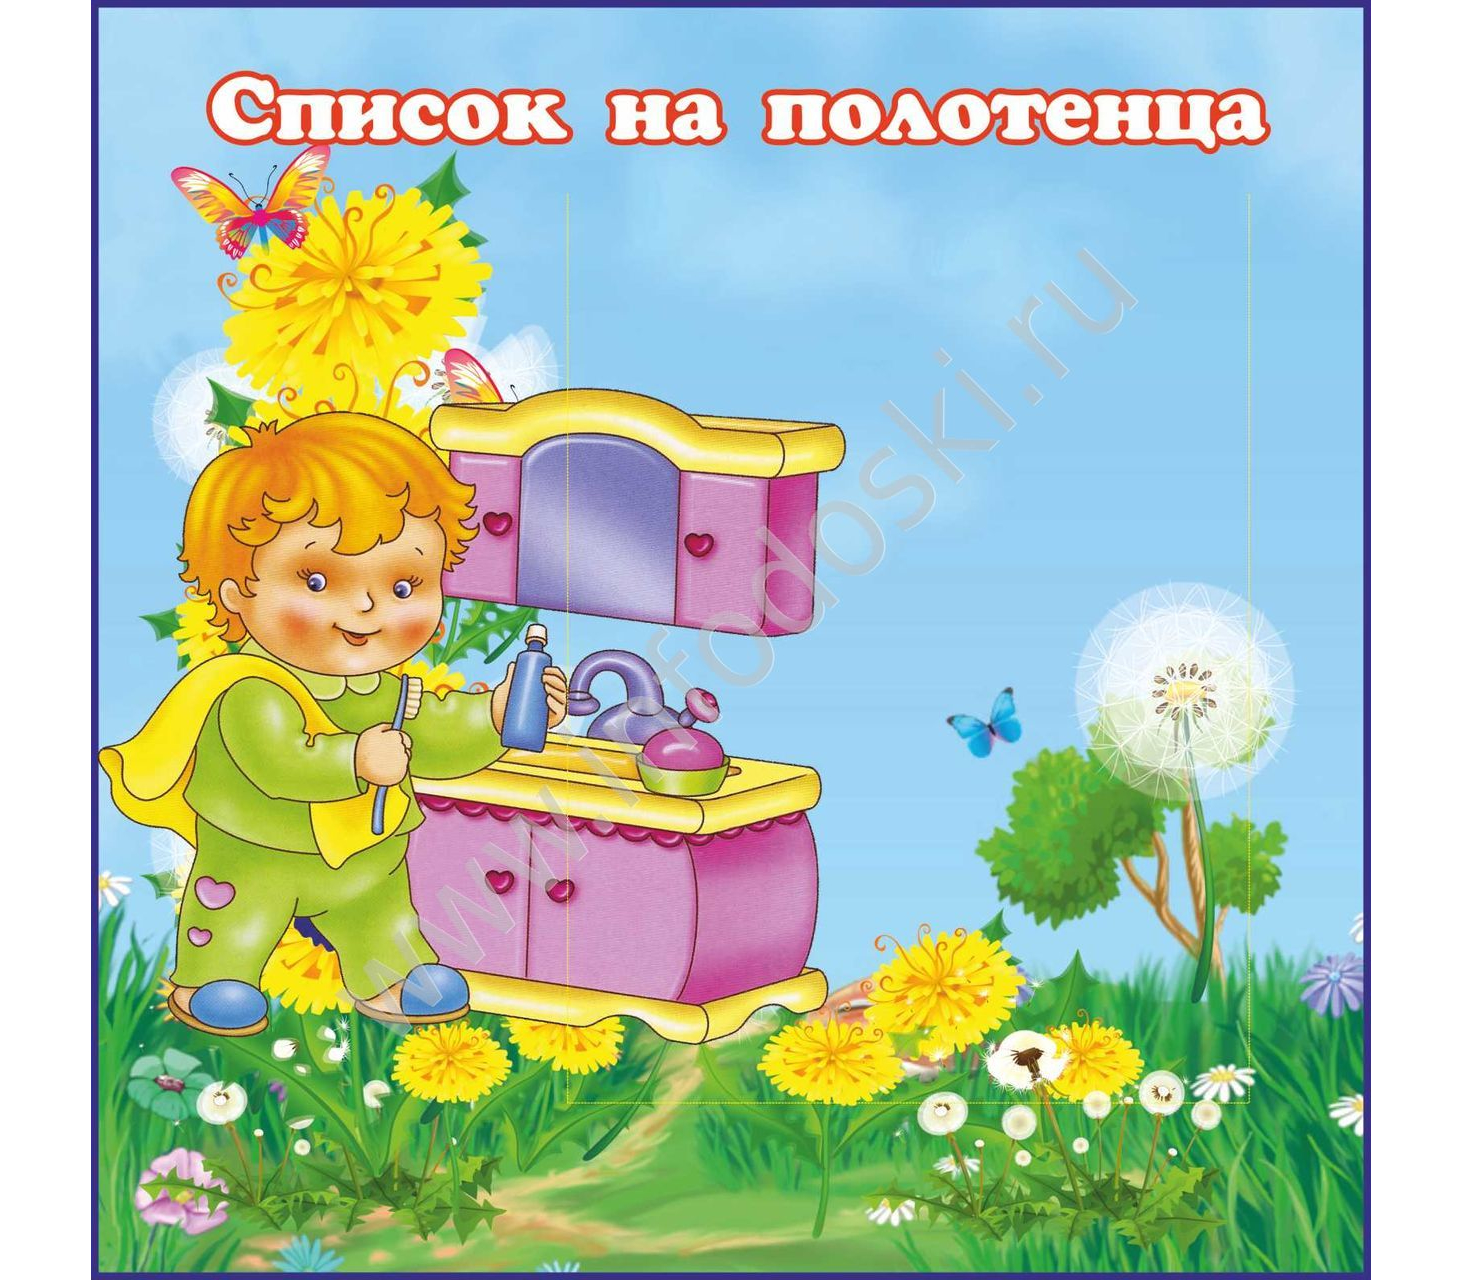 Полотенце картинки в детский сад